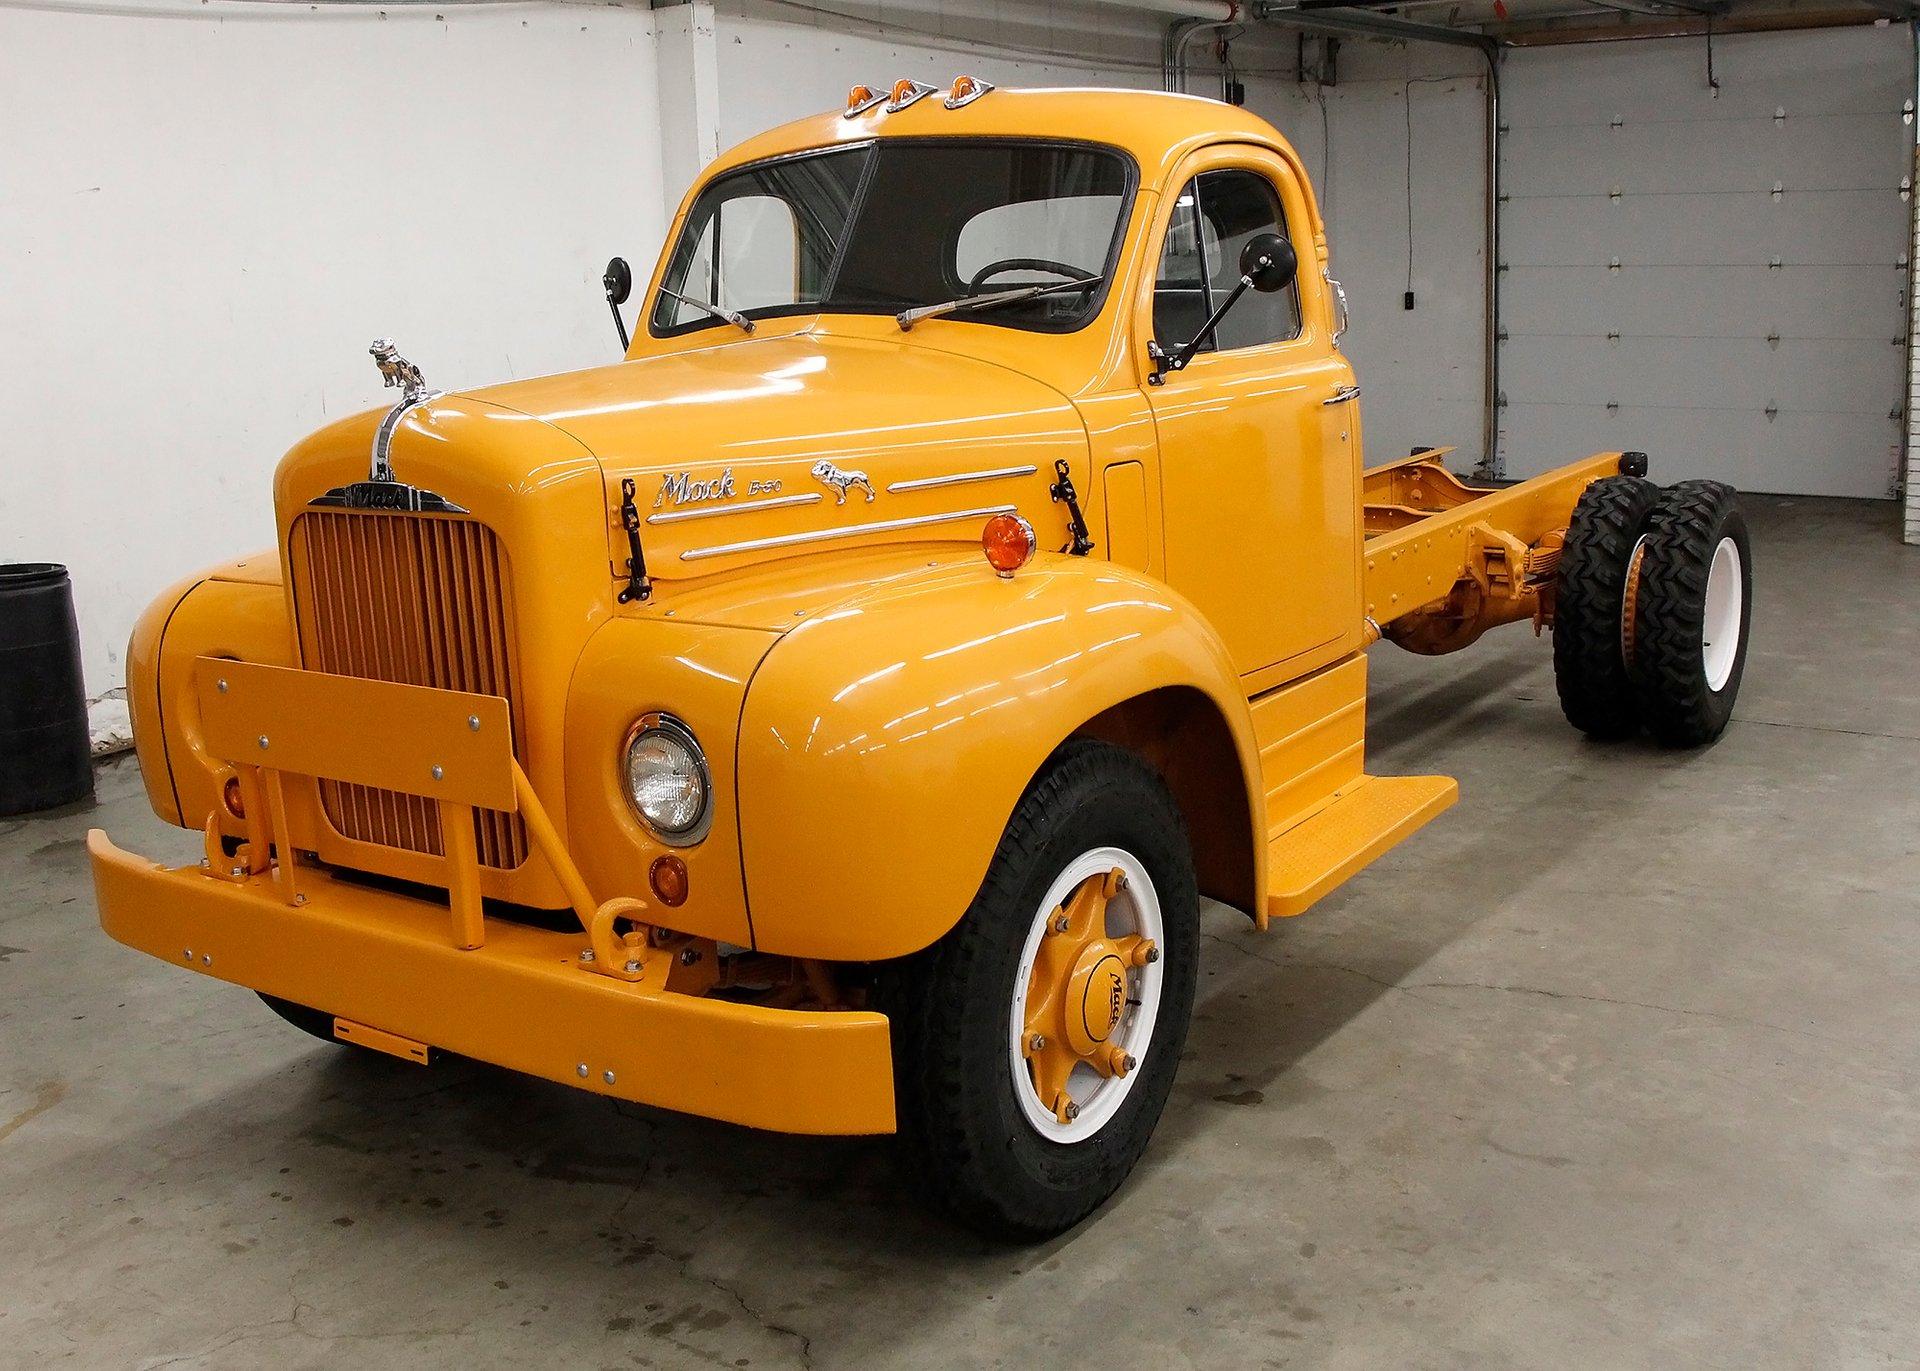 1957 Mack B-30 Truck